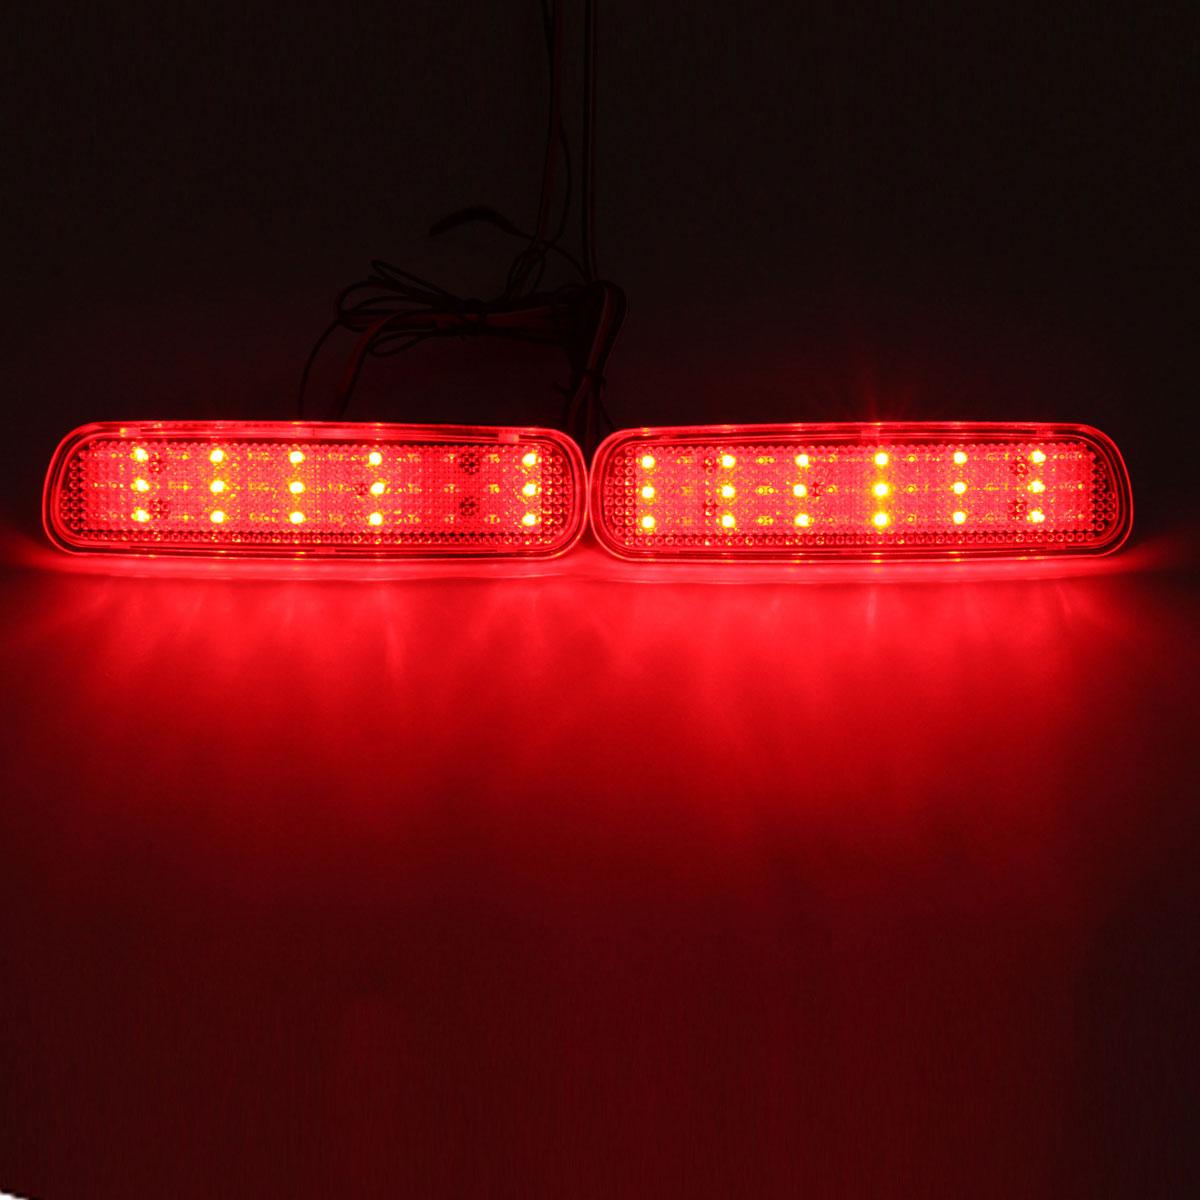 Пара задний бампер отражатель LED тормоз хвост свет сигнала поворота противотуманная фара для LEXUS LX470 - фото 2